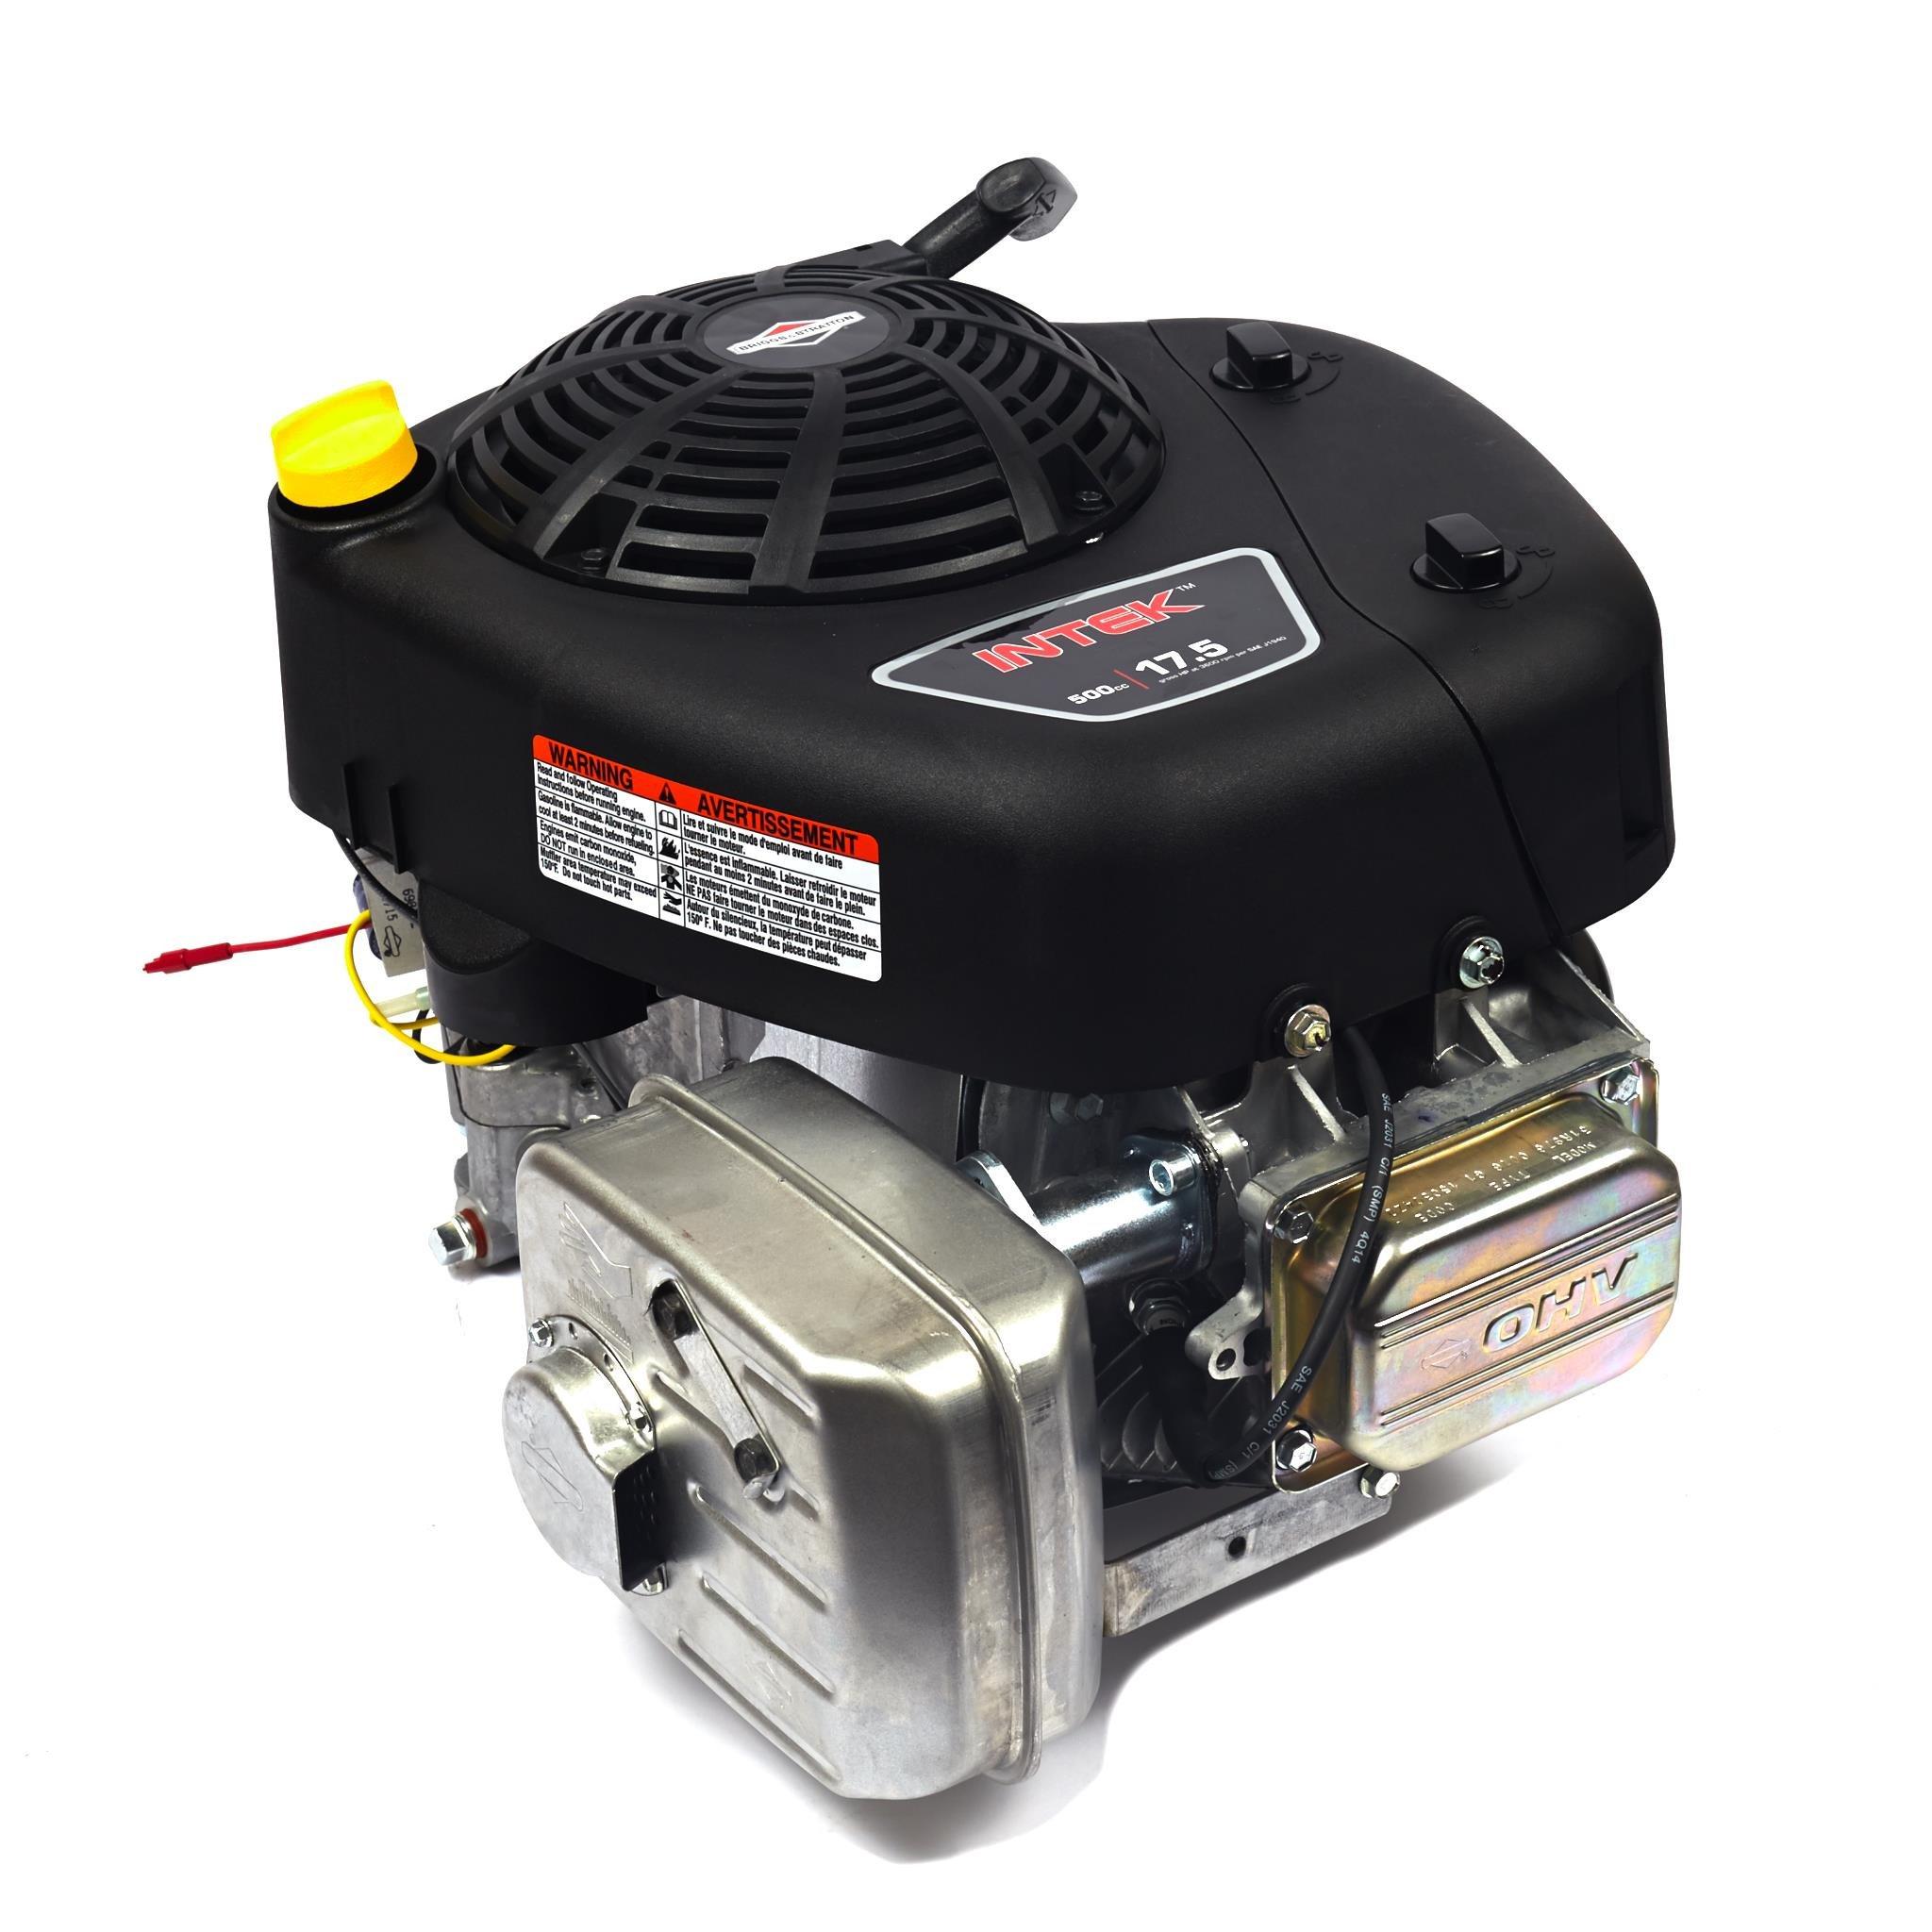 Briggs & Stratton Briggs and Stratton 31R976-0016-G1 725 Powerbuilt Series Engine